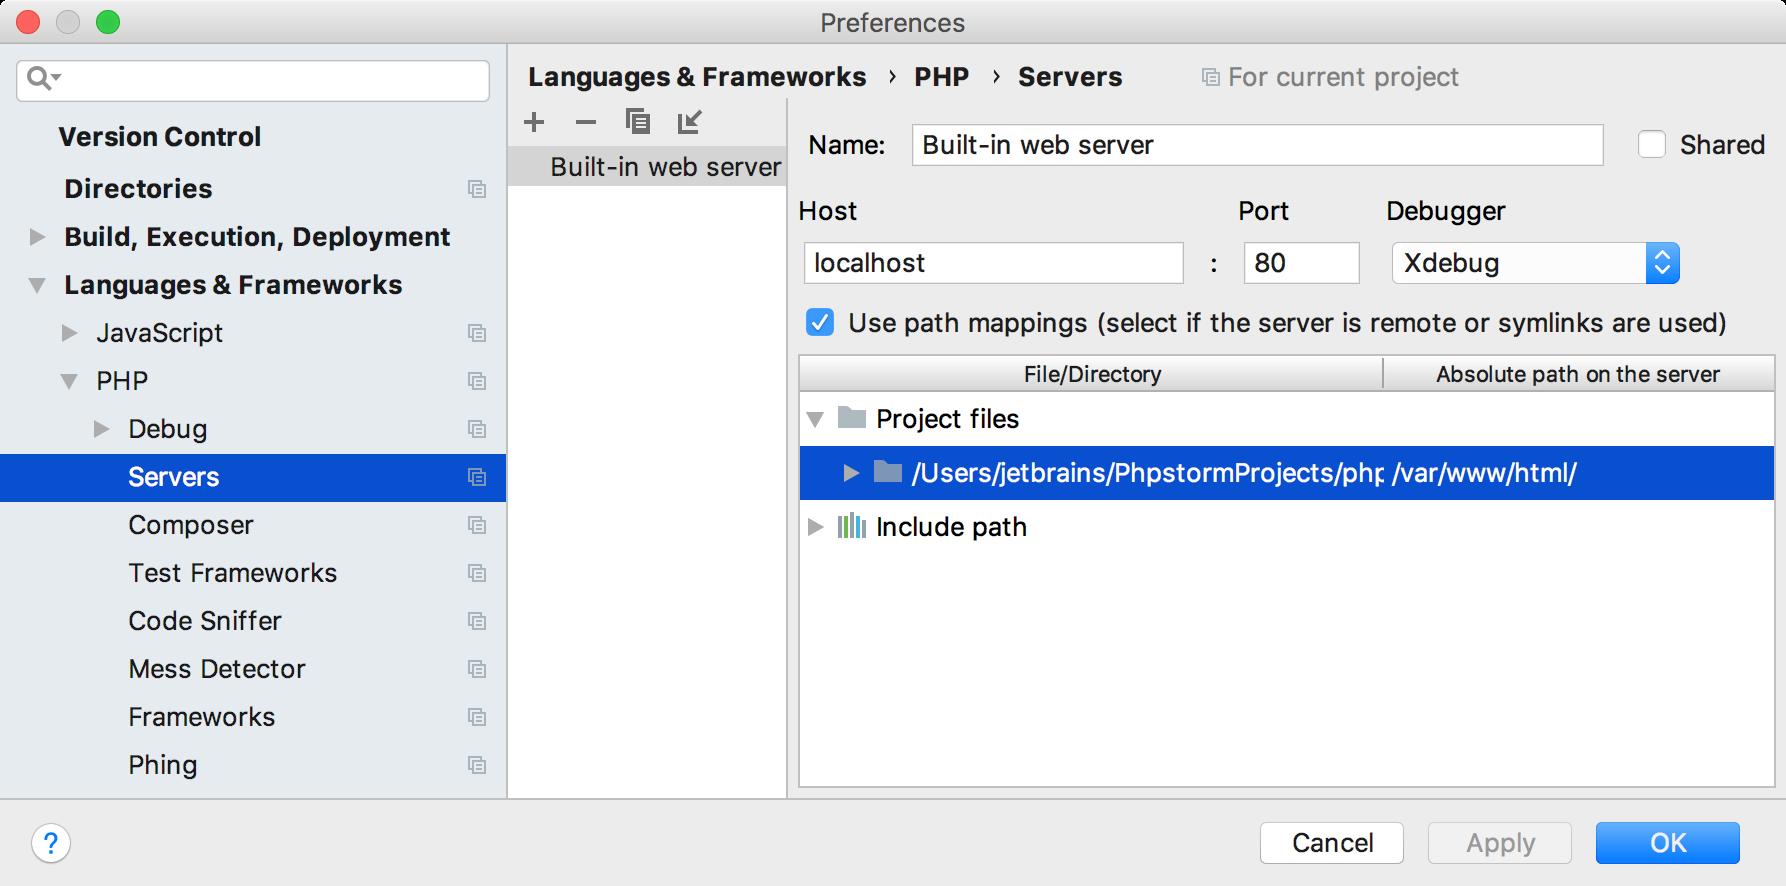 ps php debug server mappings